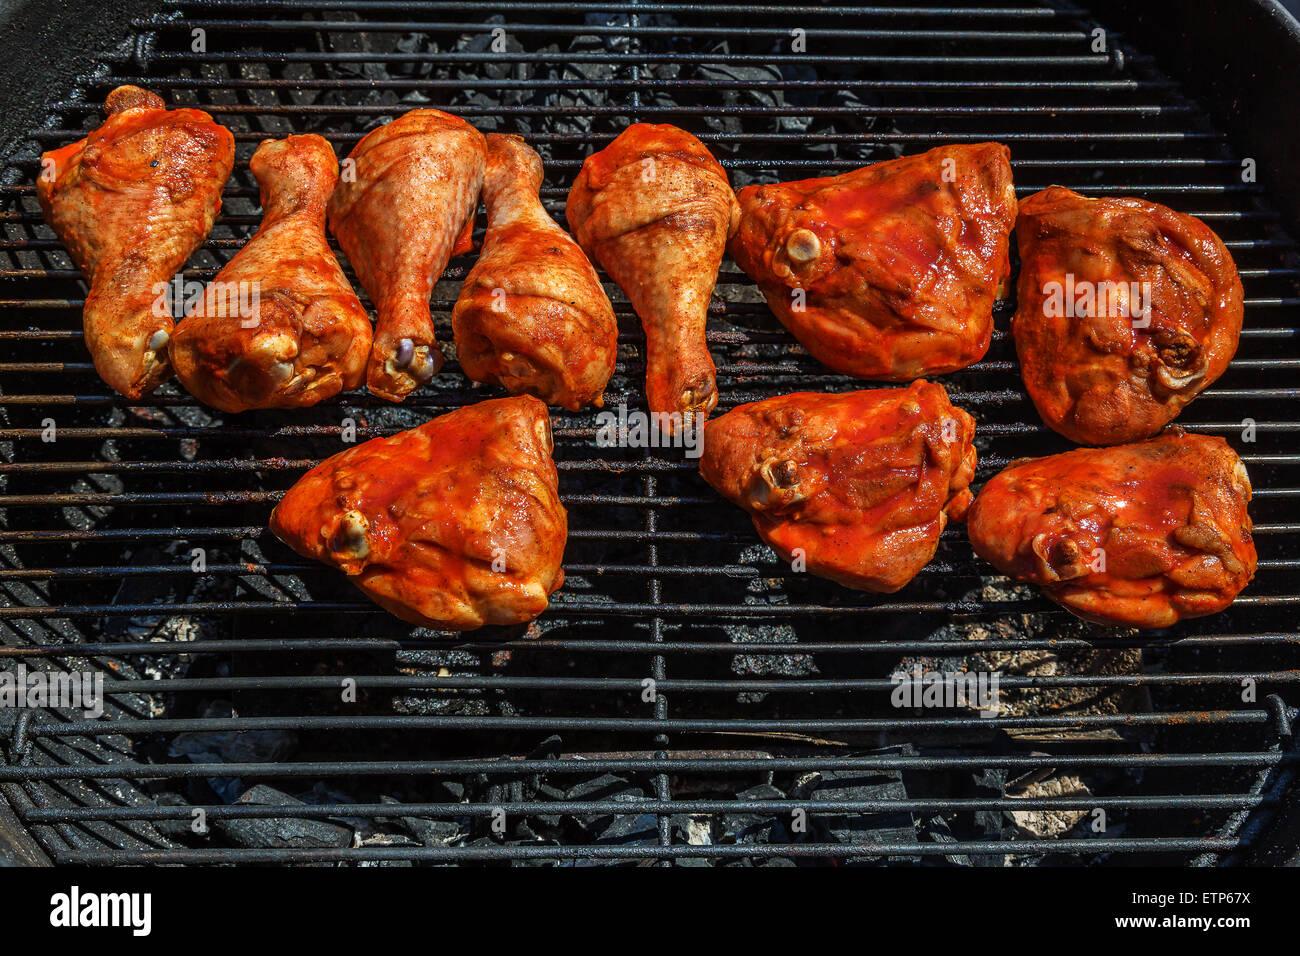 Collection Smoking Chicken Legs Pictures - Asianfashion